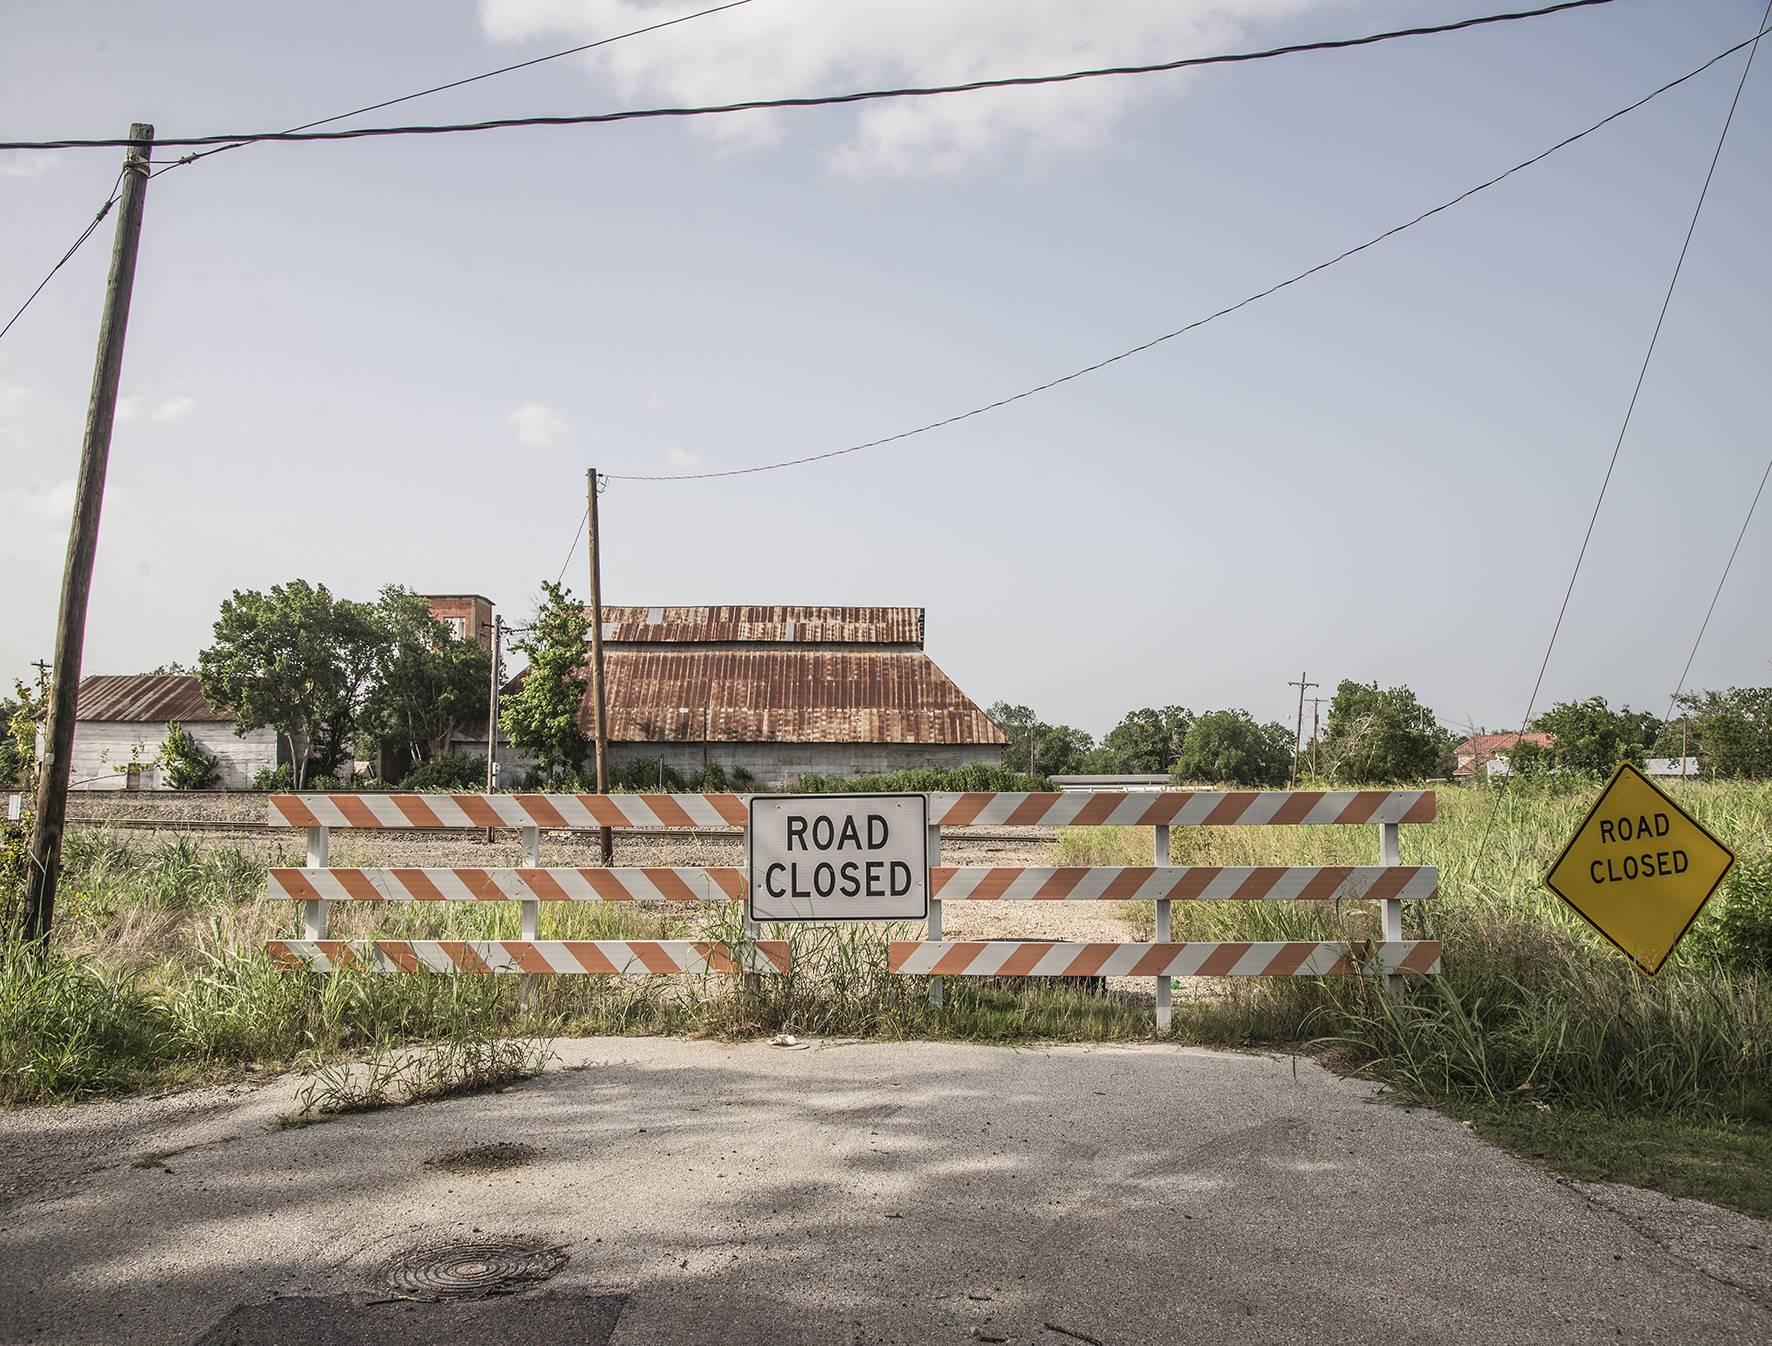 33 Far Fading West, Road Closed, 2016